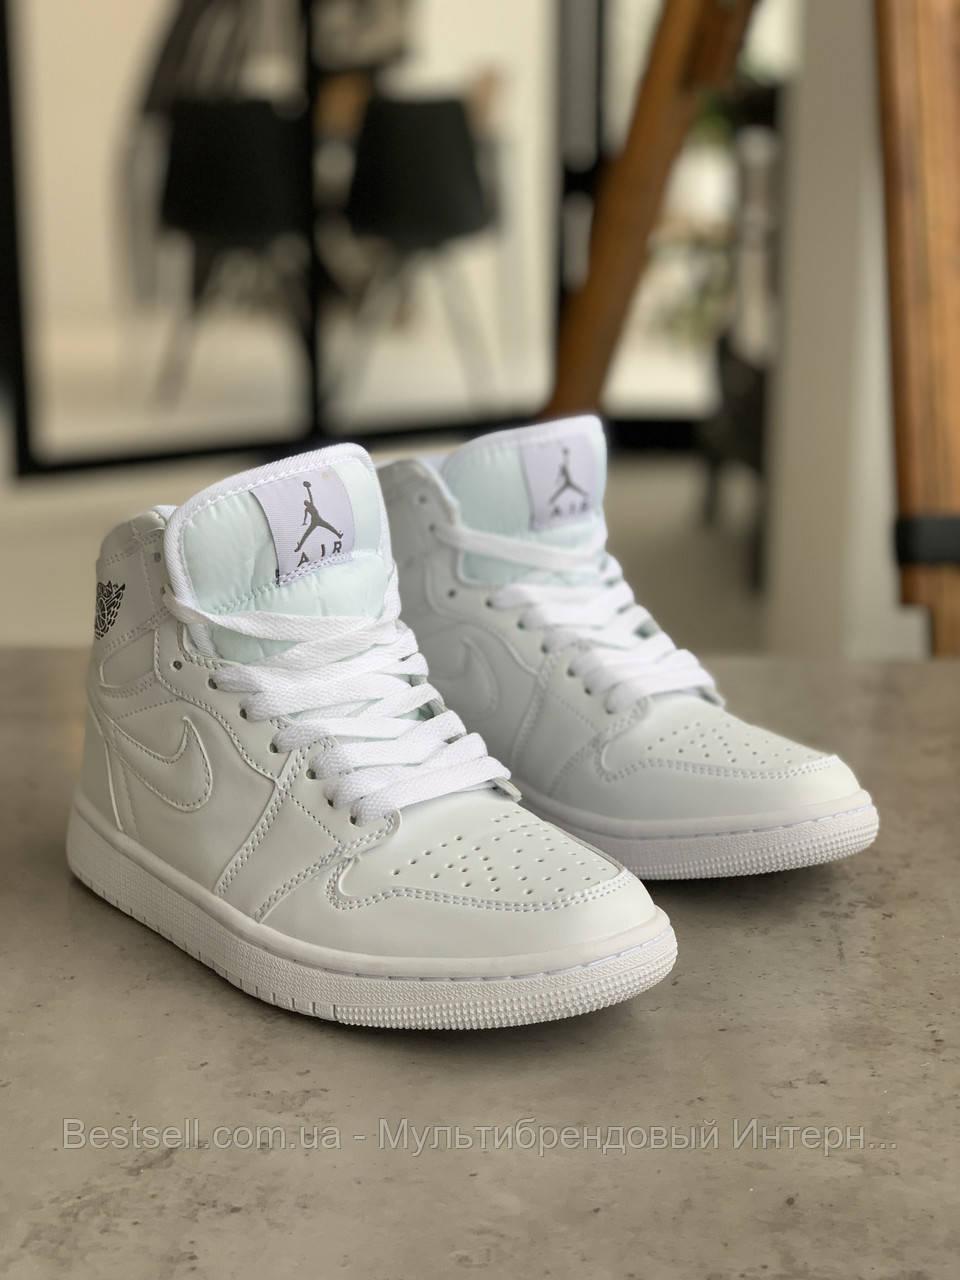 Кроссовки Nike Air Jordan 1 Retro White Найк Аир Джордан 1 Ретро Белые (41,43,44,45)